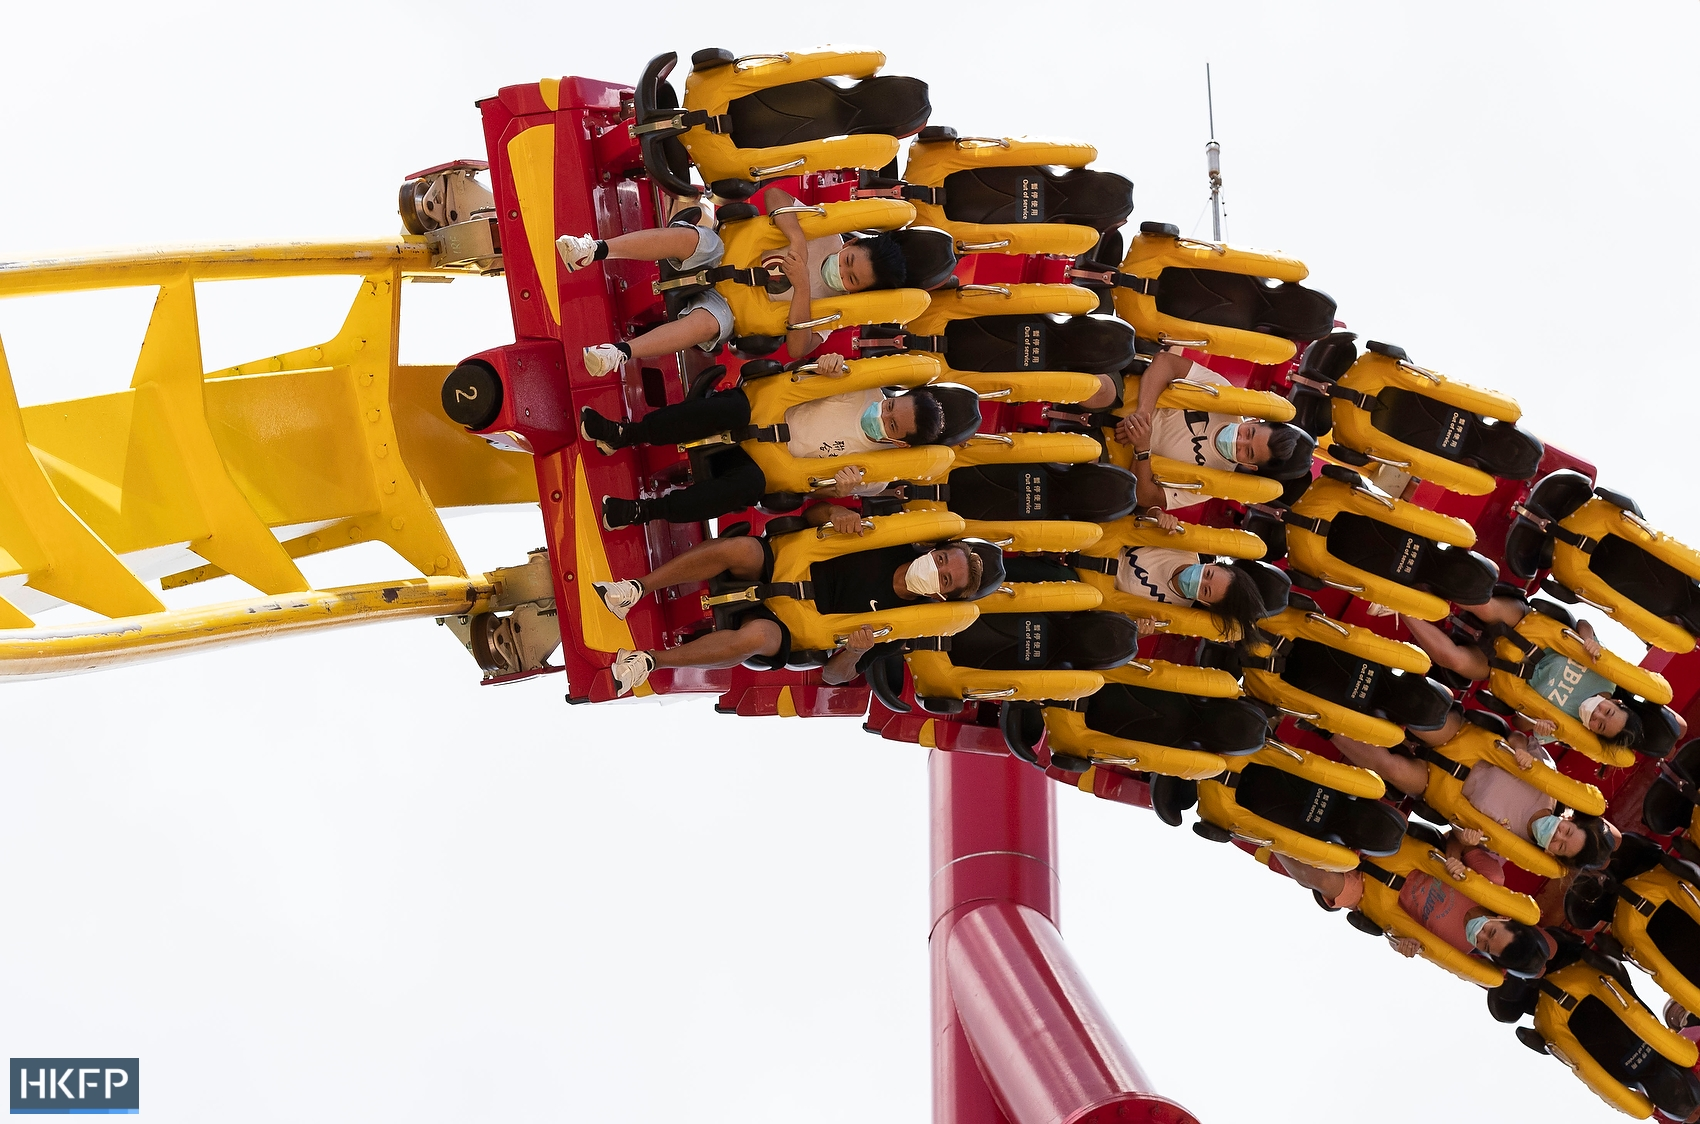 mask ocean park rollercoaster coronavirus covid masks